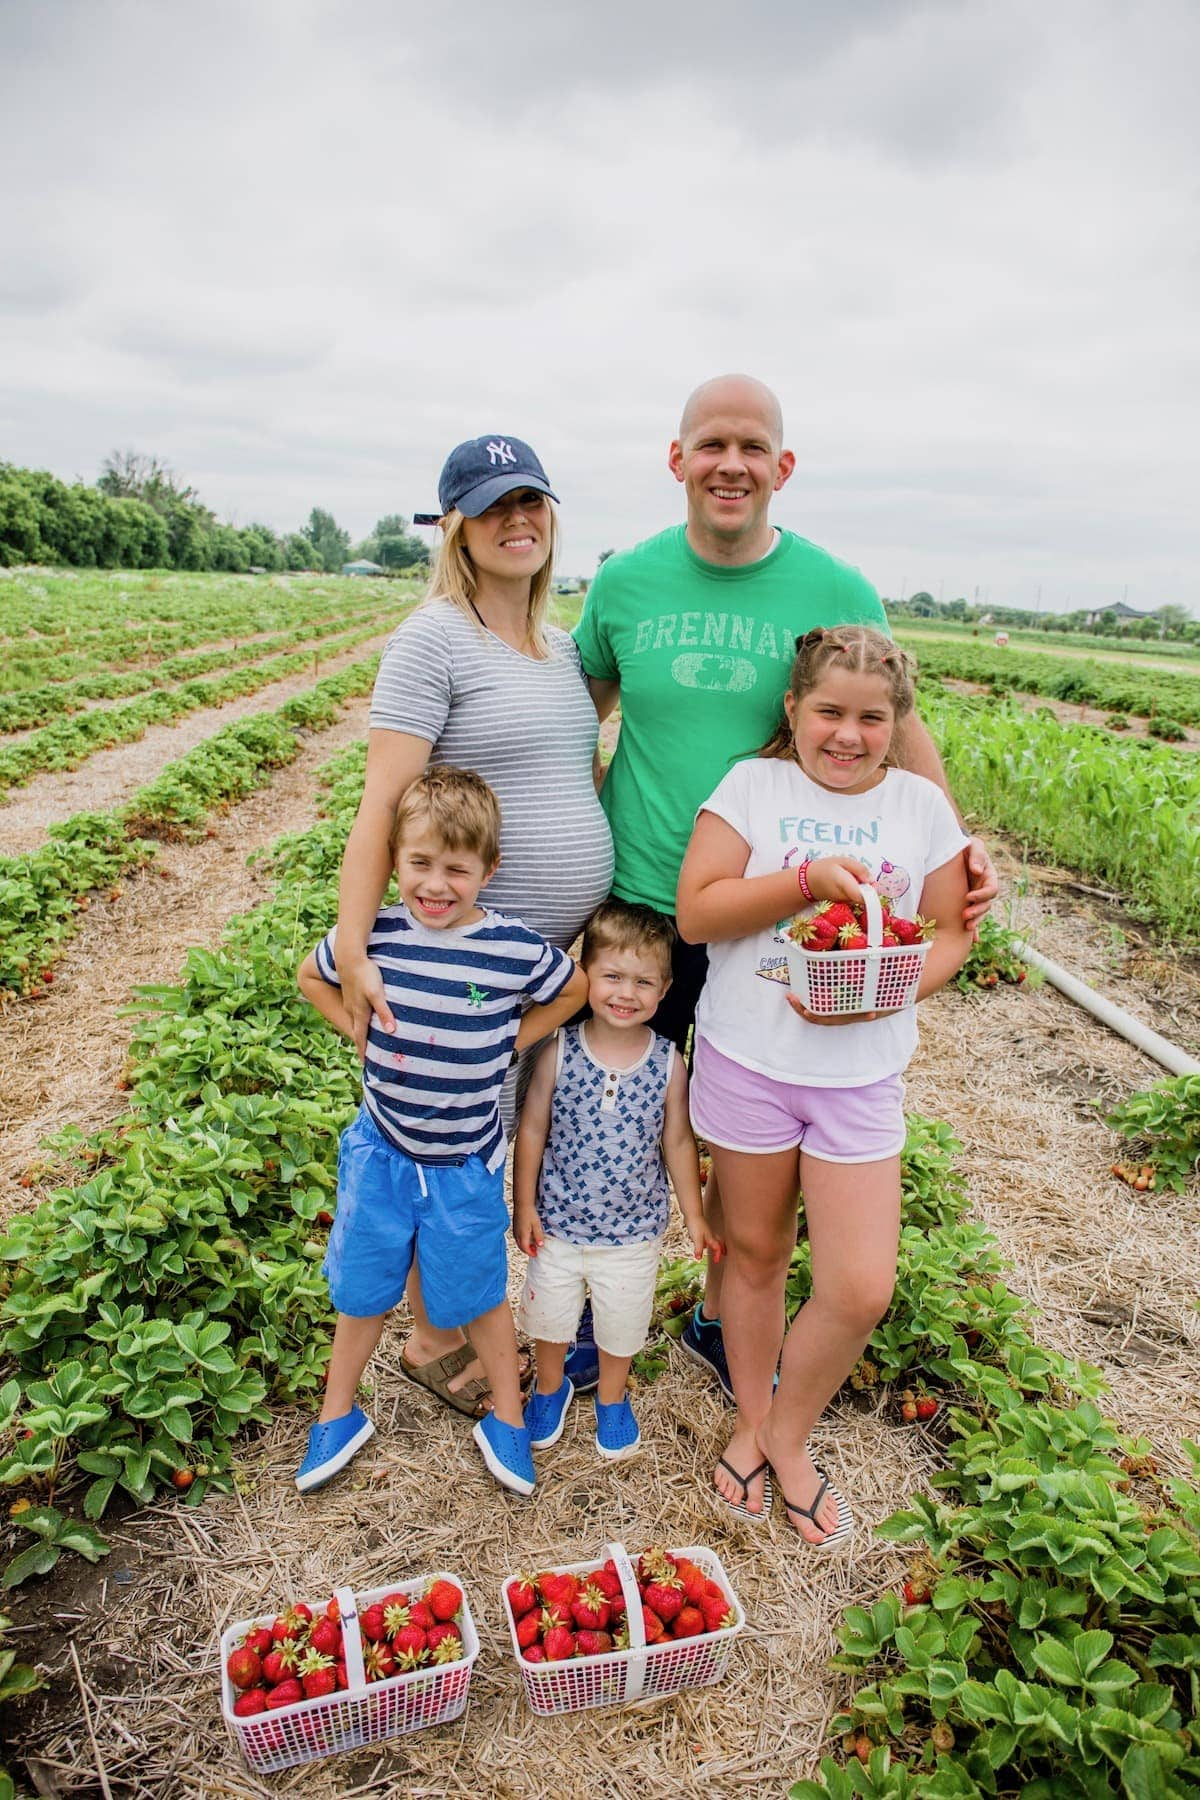 Brennan family strawberry picking